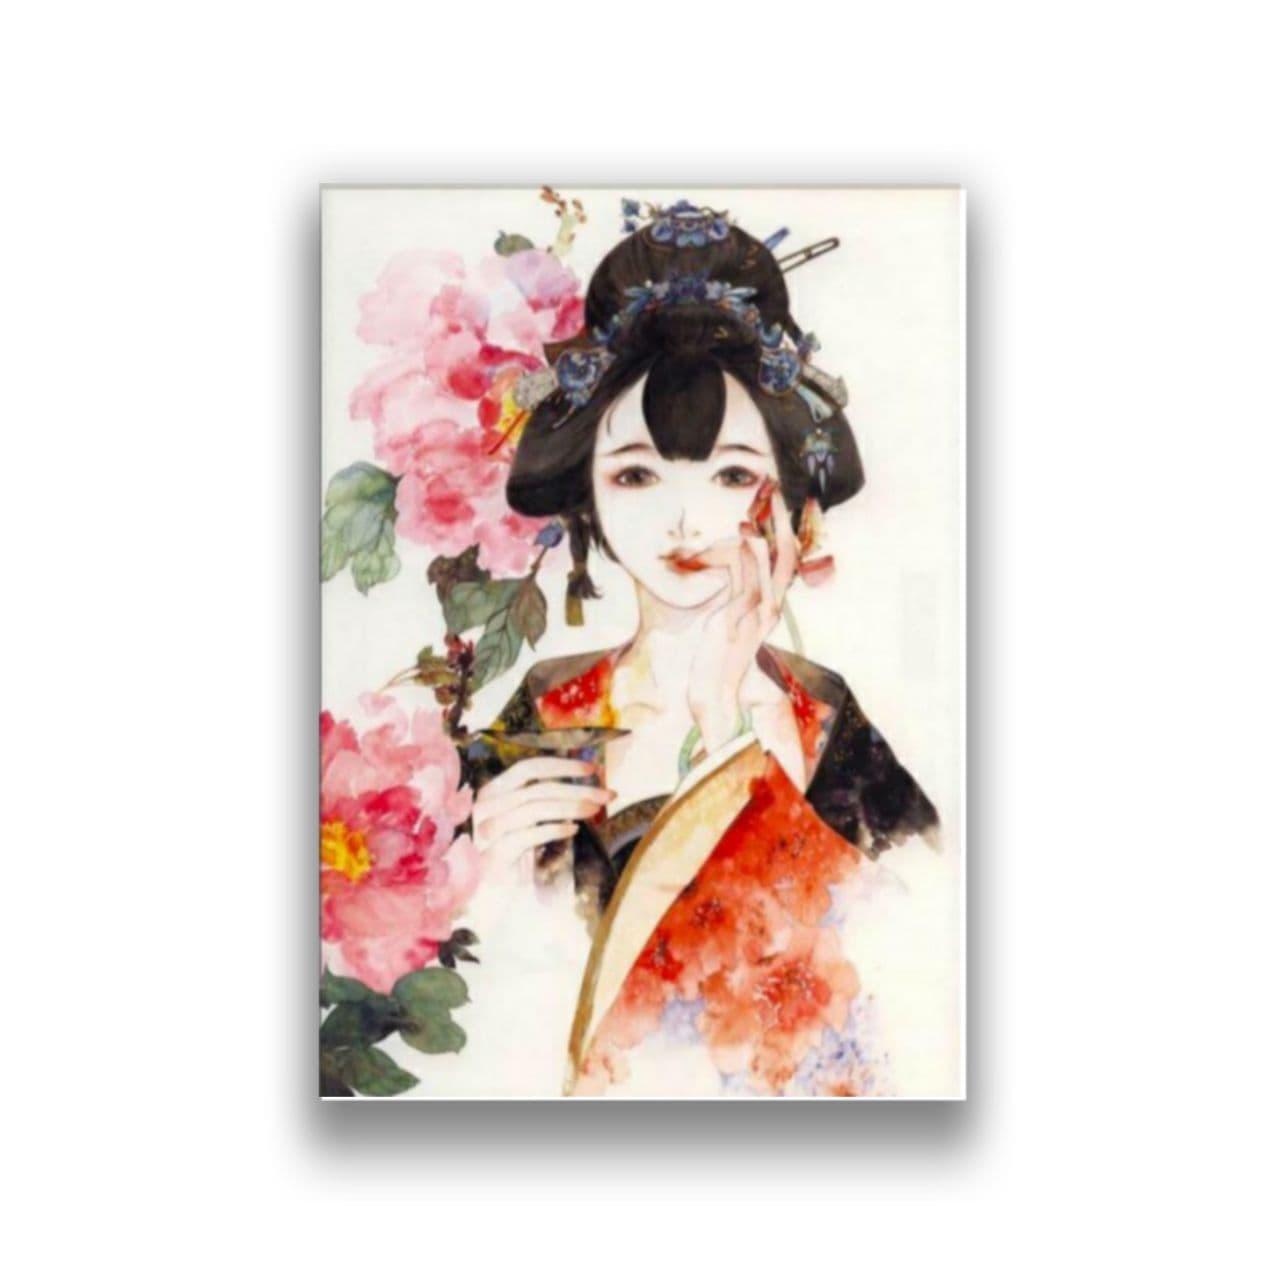 Japaneese woman